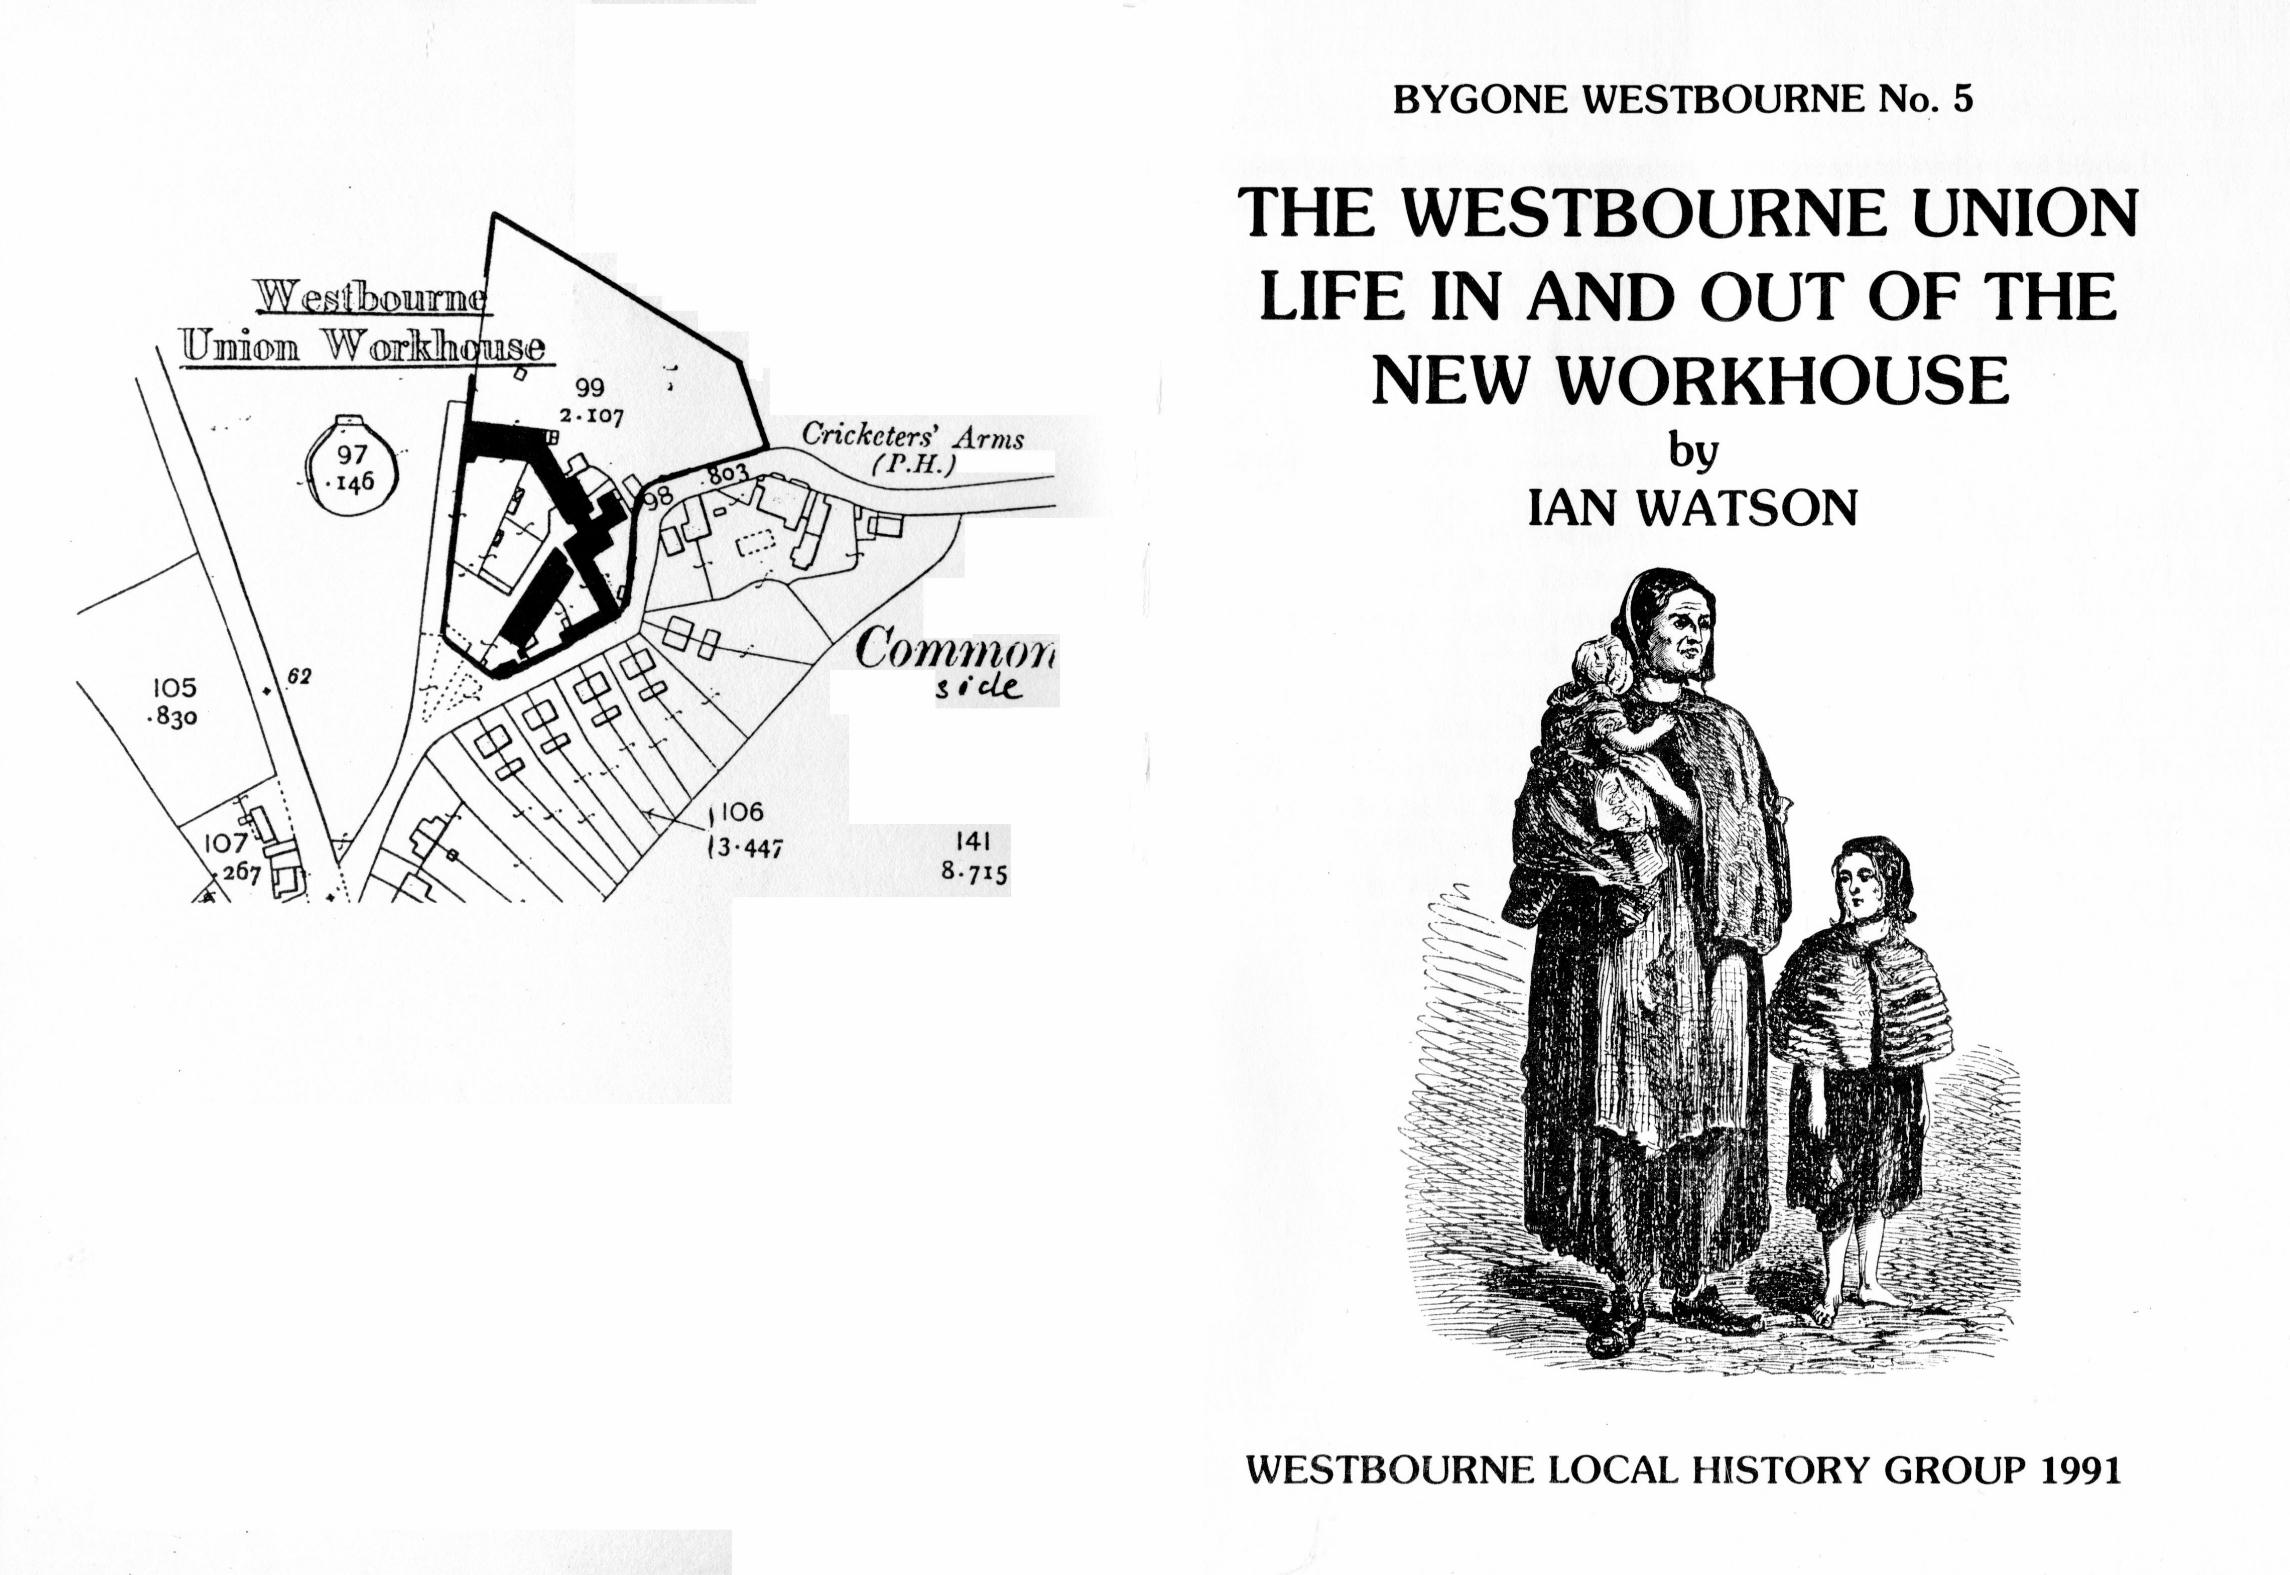 Westbourne History Union Workhouse Poor Law 1834 Ian Watson